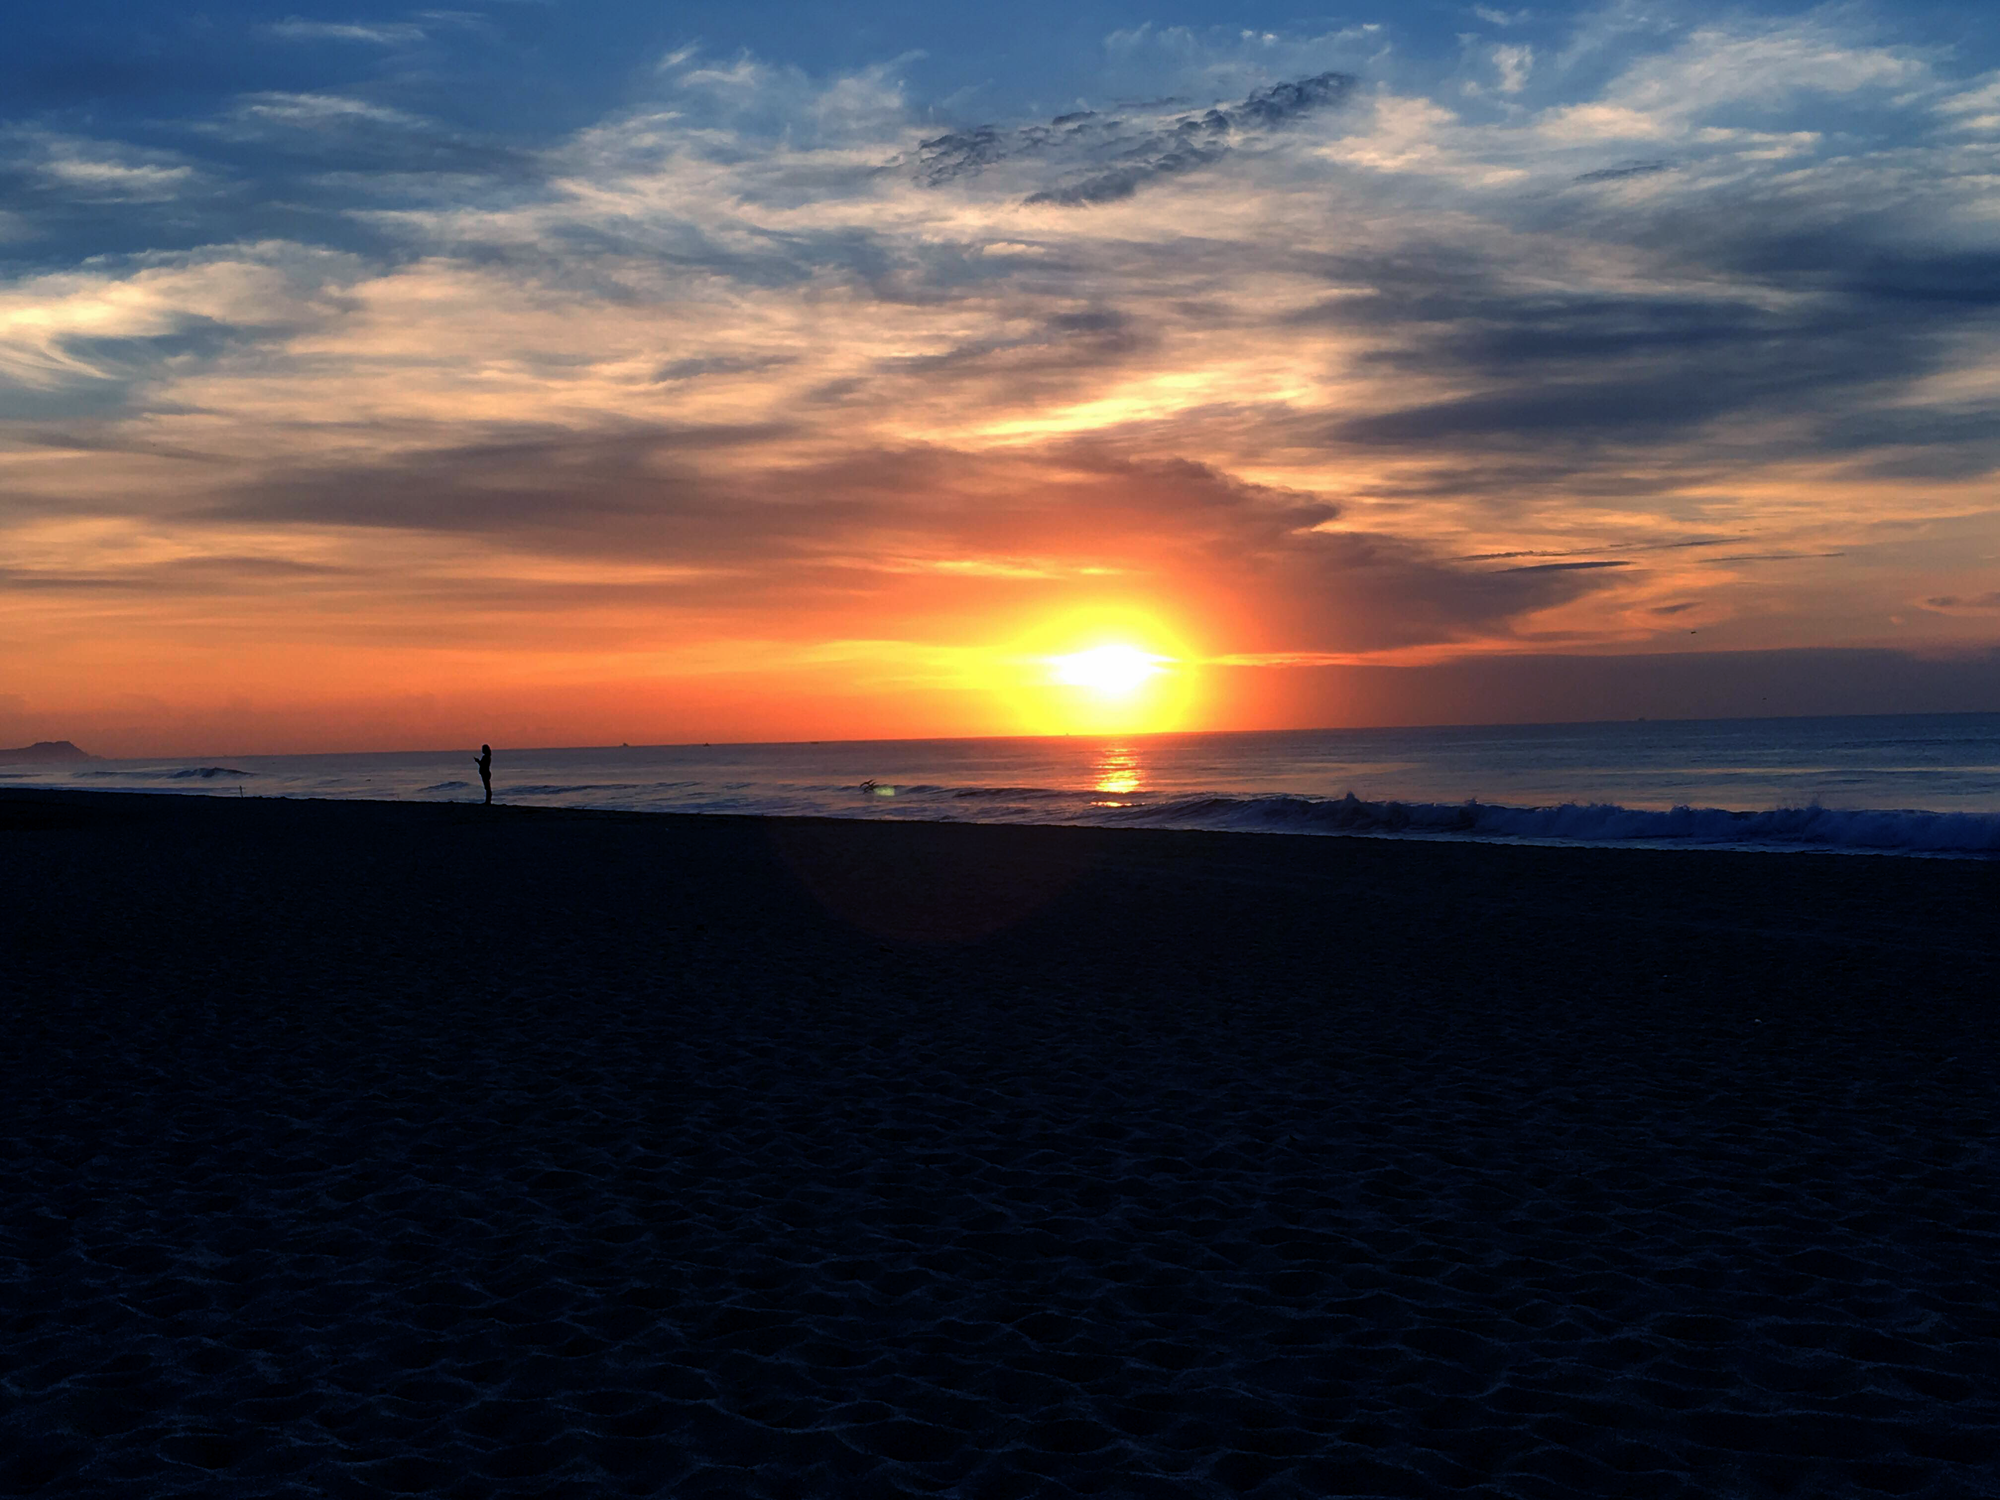 San Jose del Cabo sunset